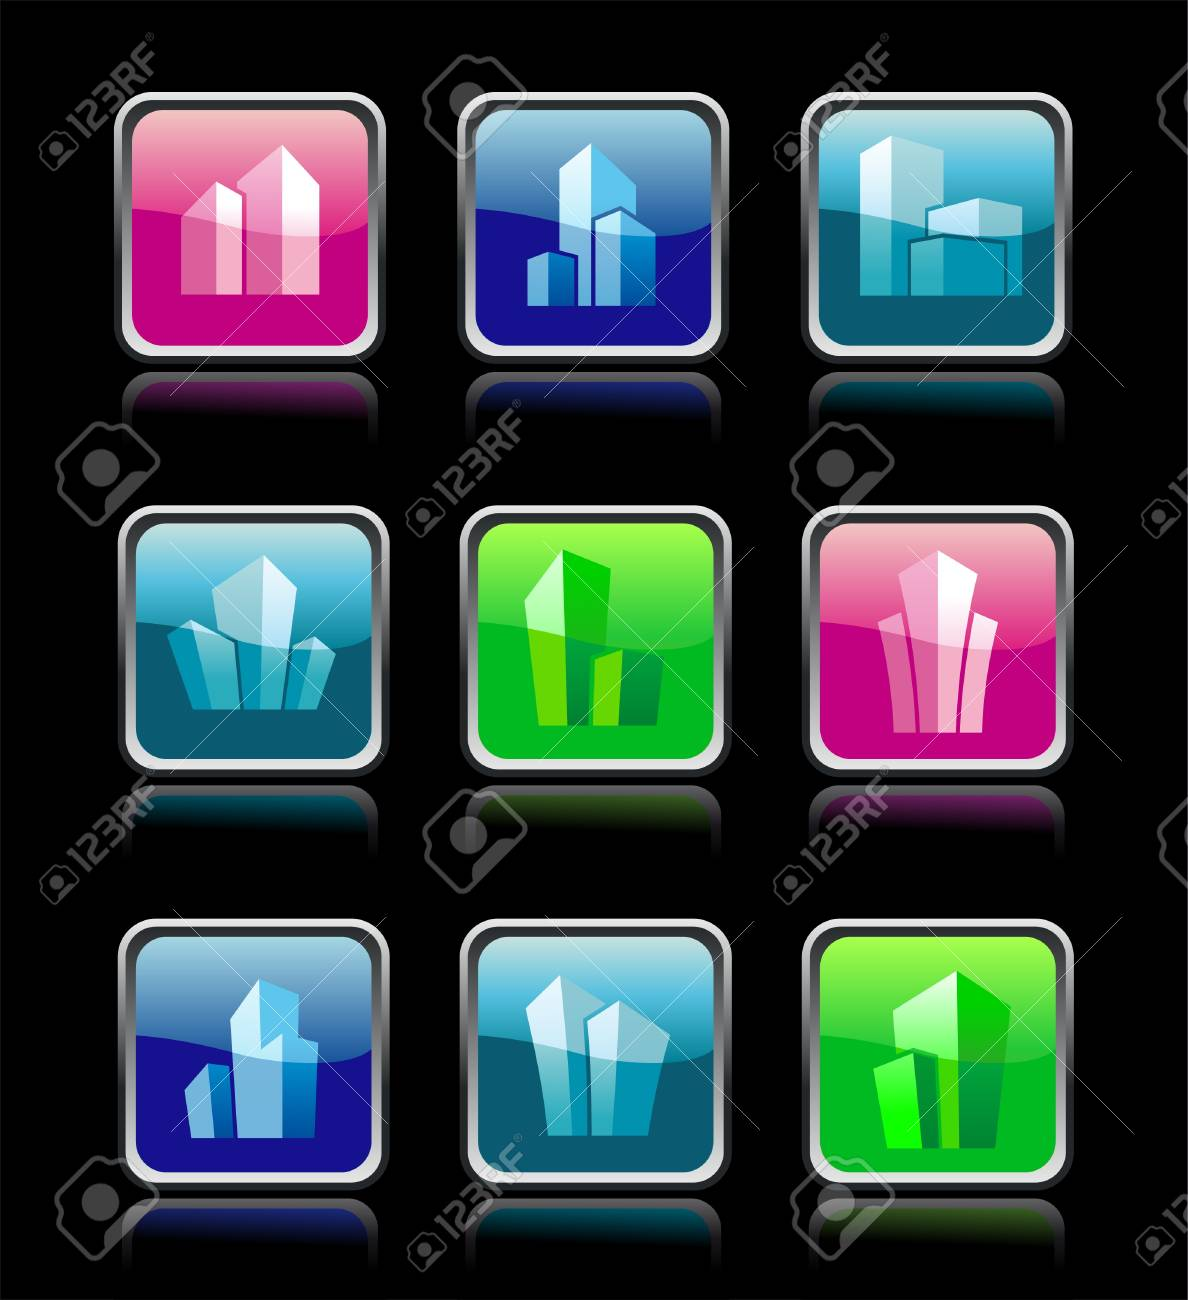 House icon collection Stock Vector - 13008117